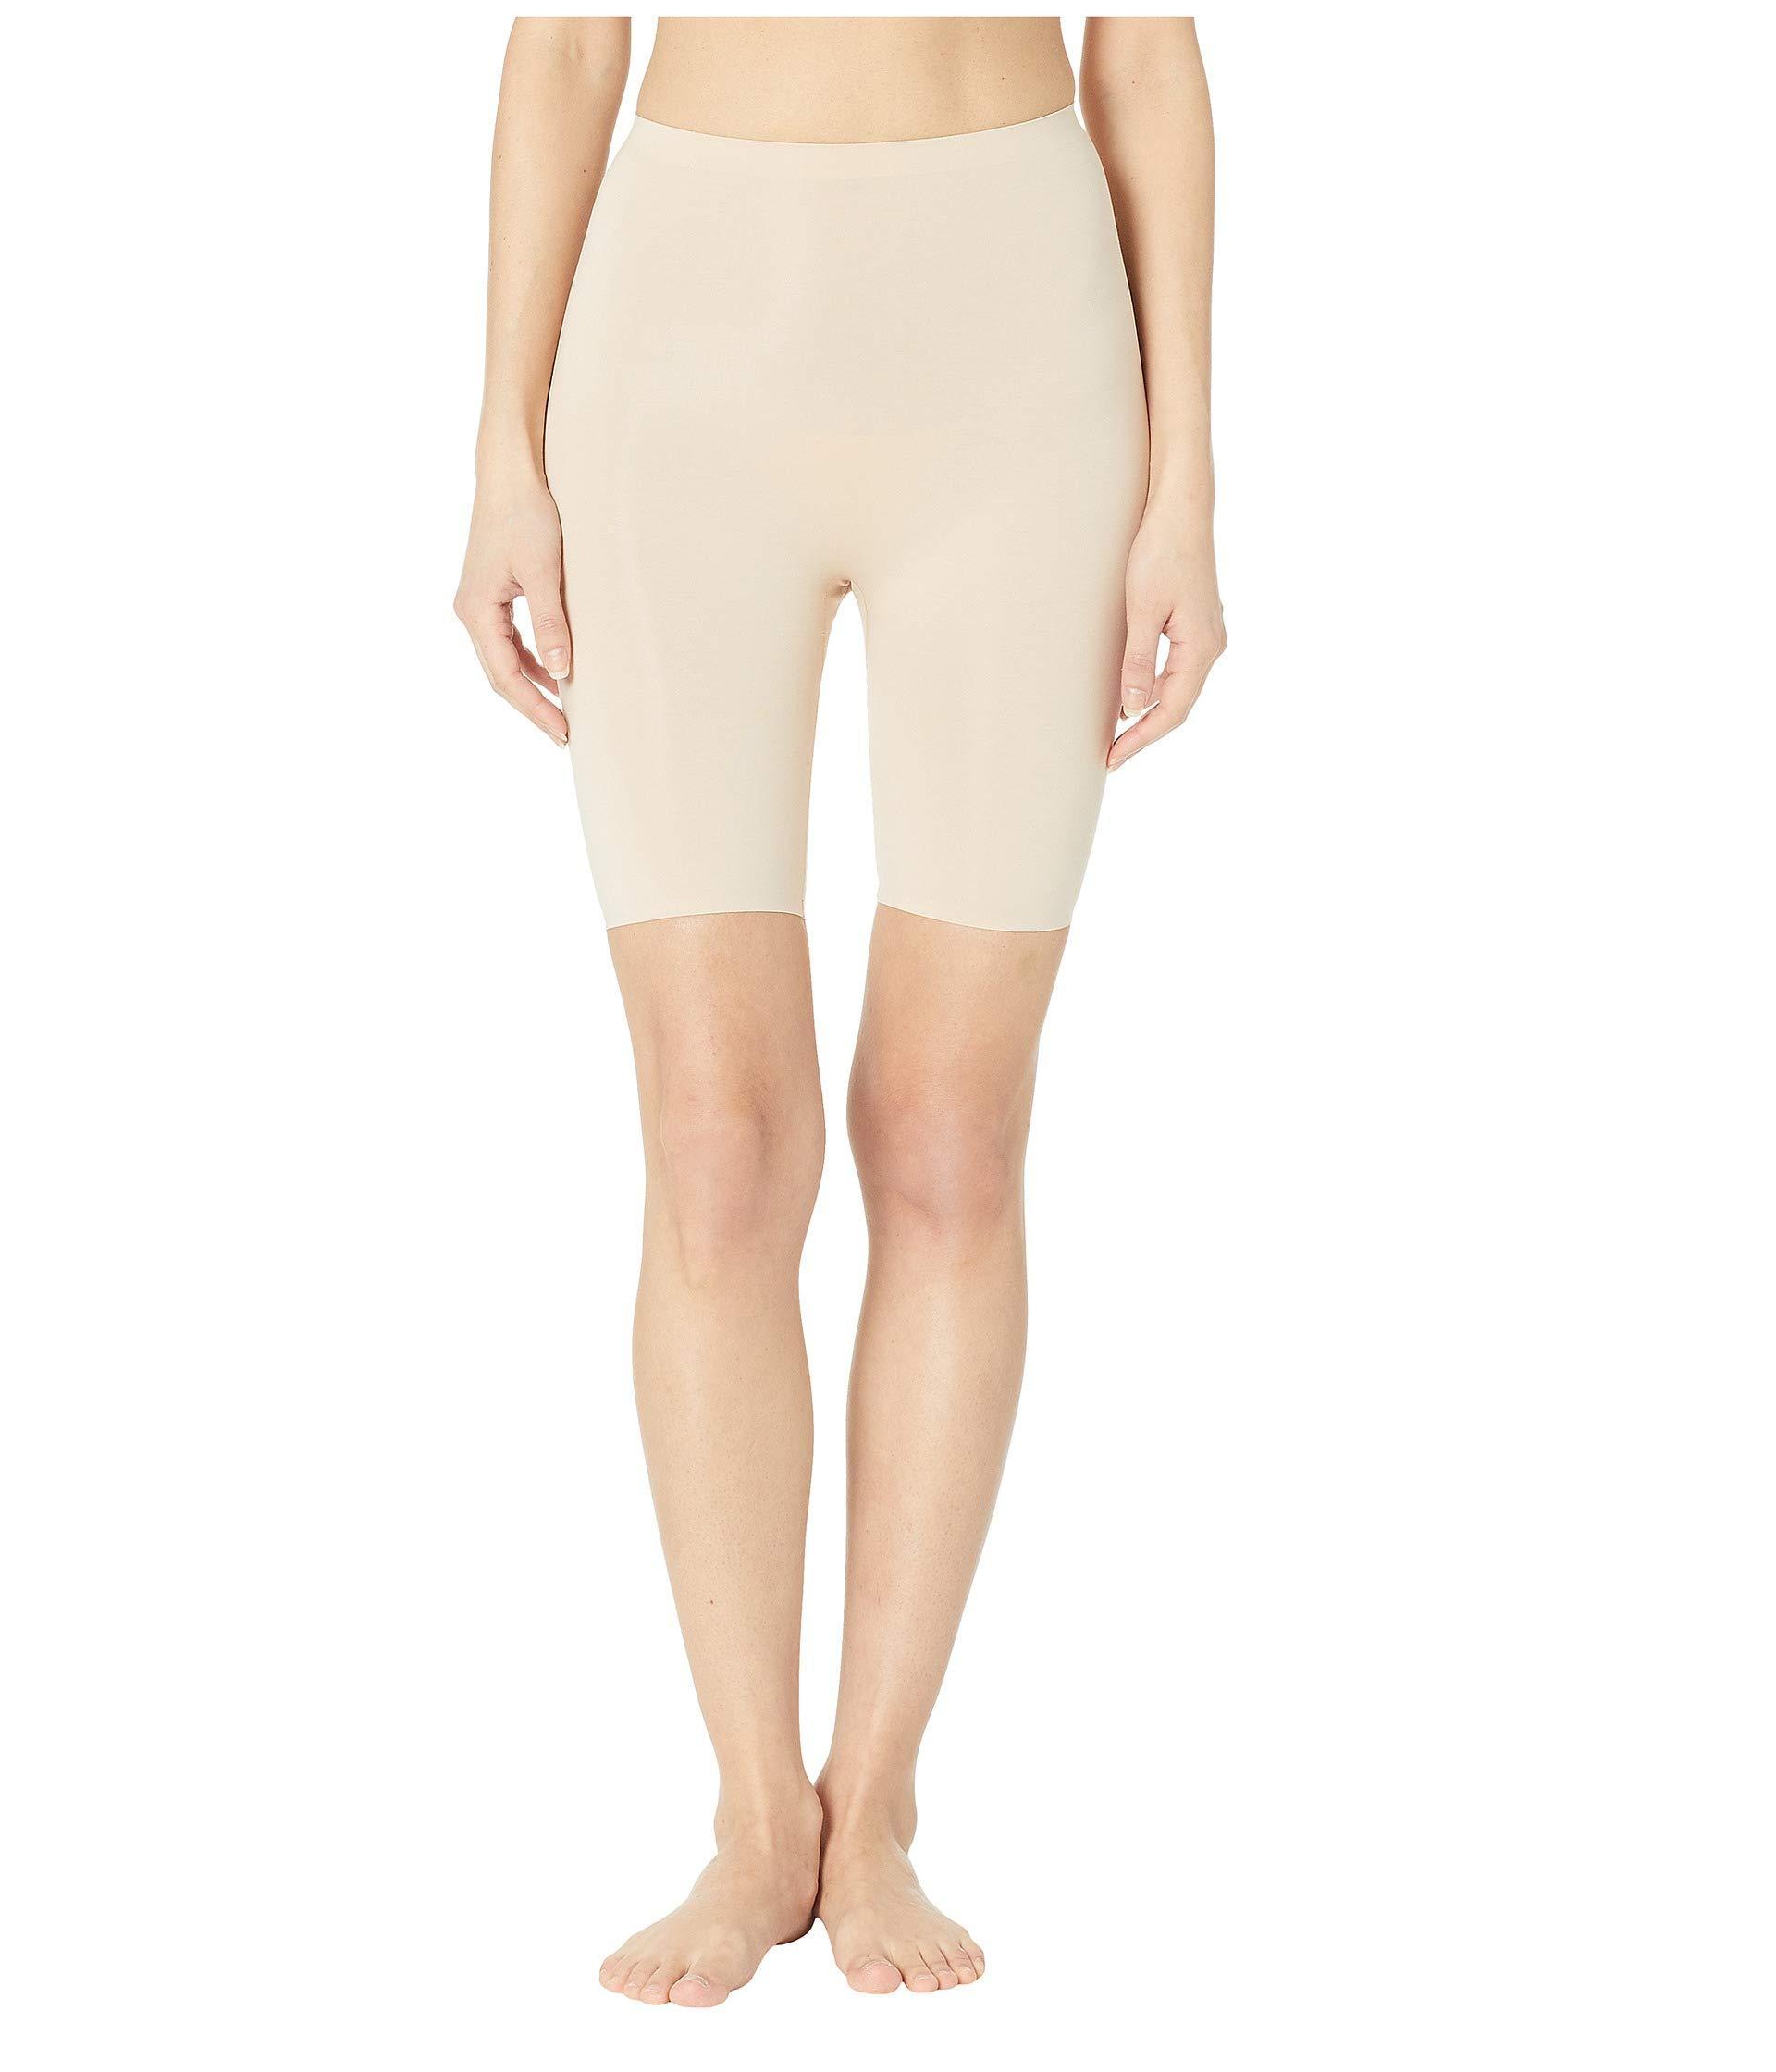 7cdc5575823f Wacoal. Natural Beyond Naked Cotton Thigh Shaper 805330 (black) Women's  Underwear